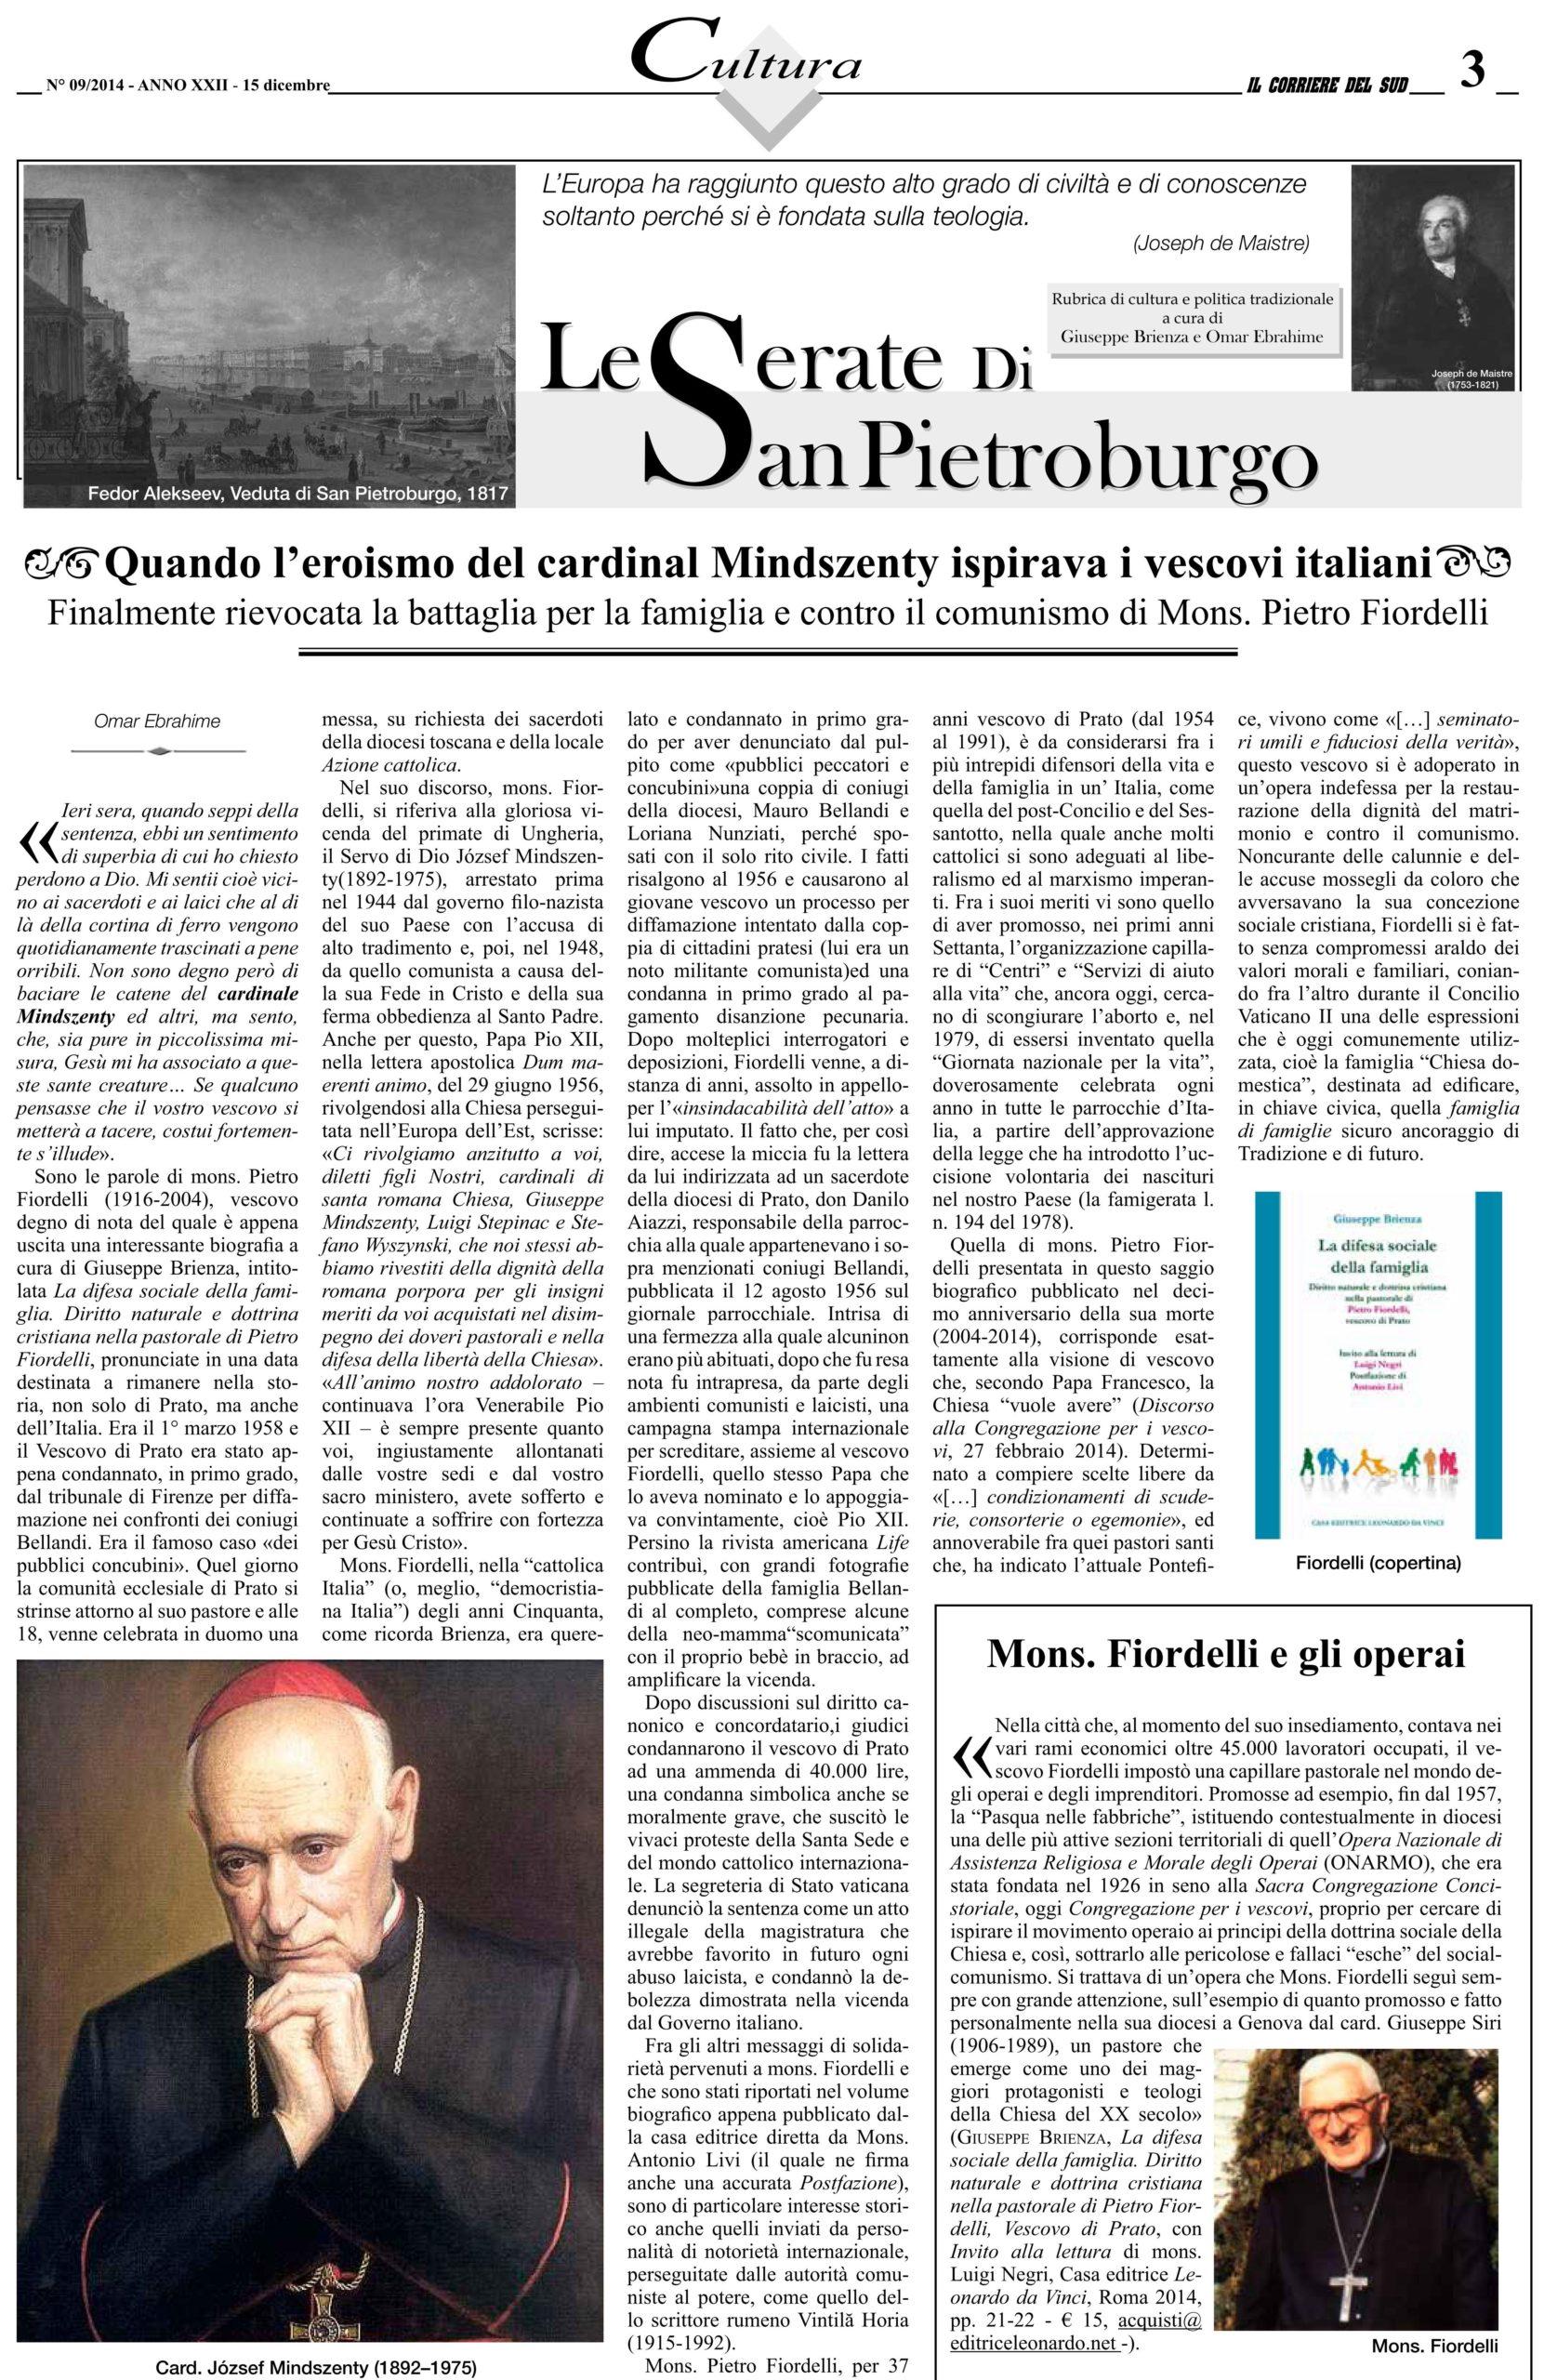 Quando l'eroismo del cardinal Mindszenty ispirava i vescovi italiani